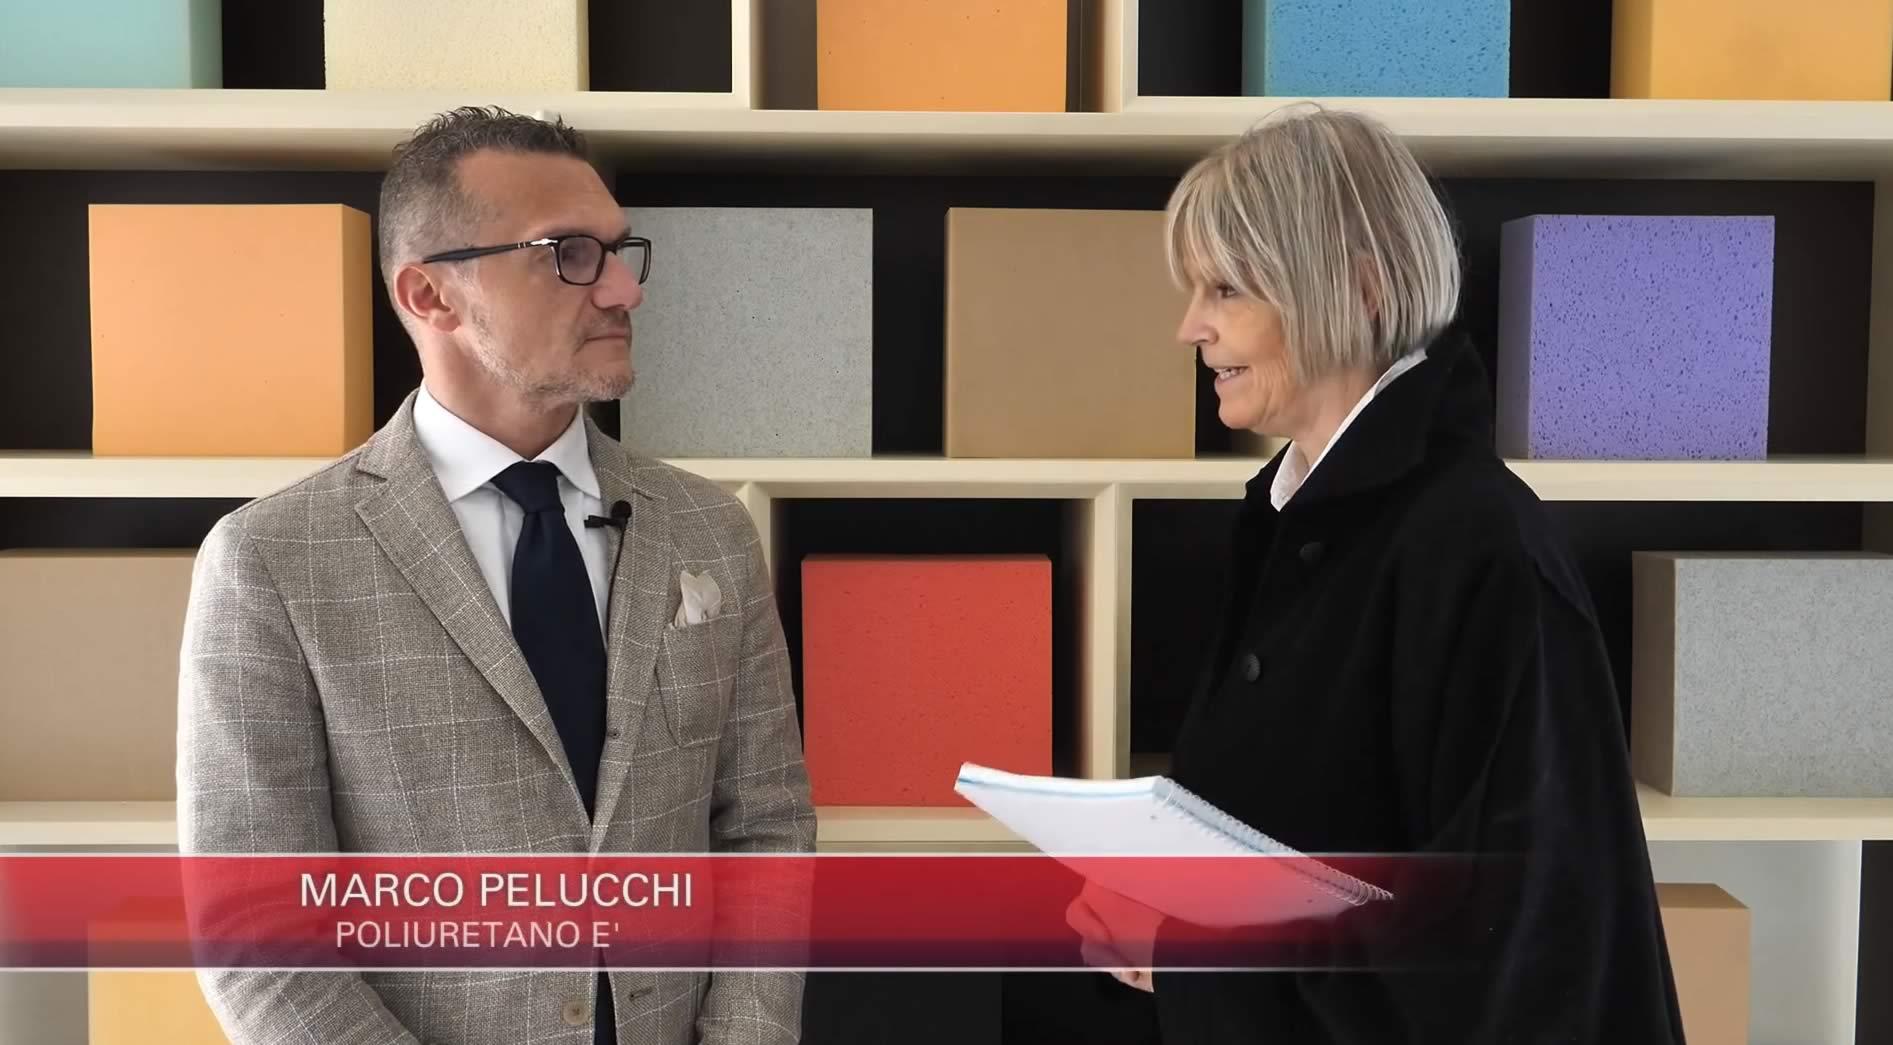 Poliuretano è alla Milano Design Week 2019